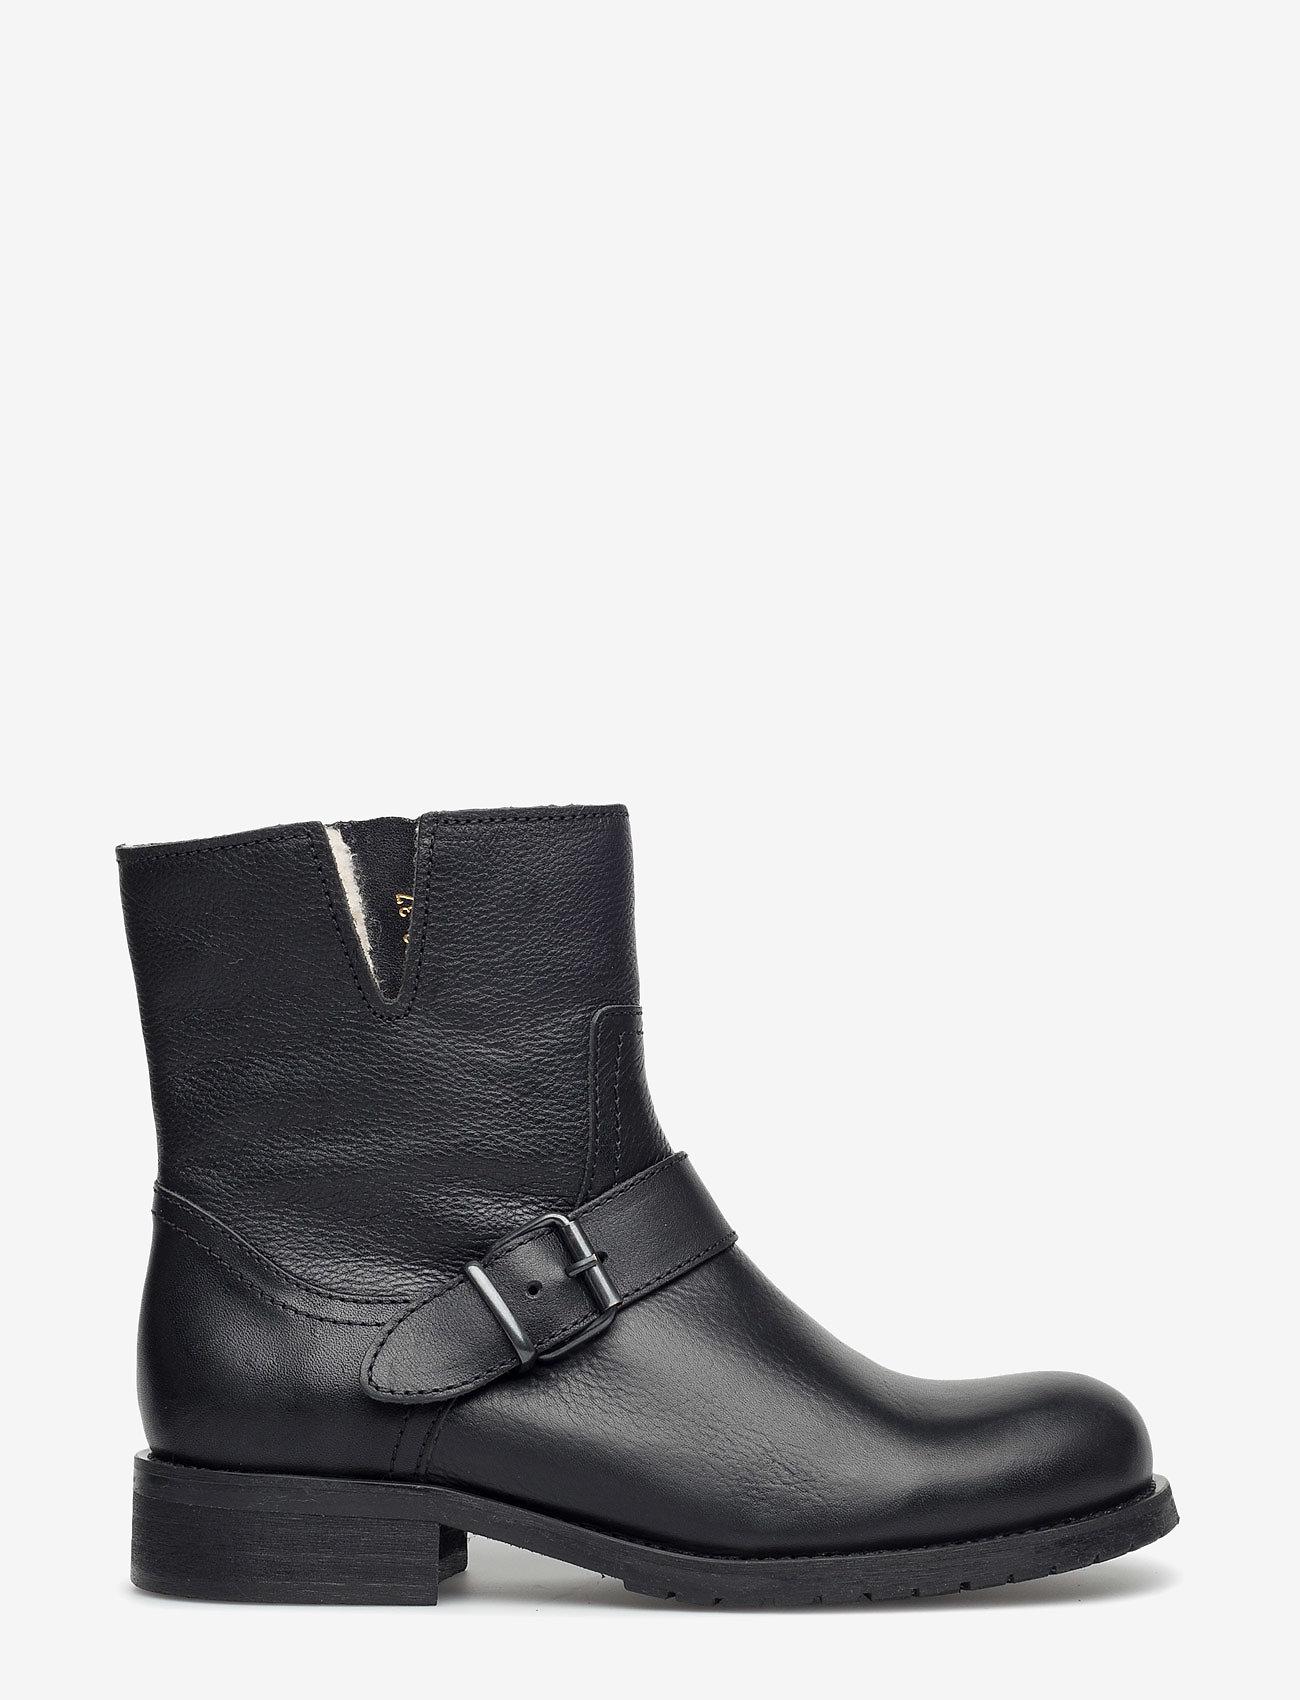 Carla F - Warm lining 81923 - flat ankle boots - black calf 80 - 1